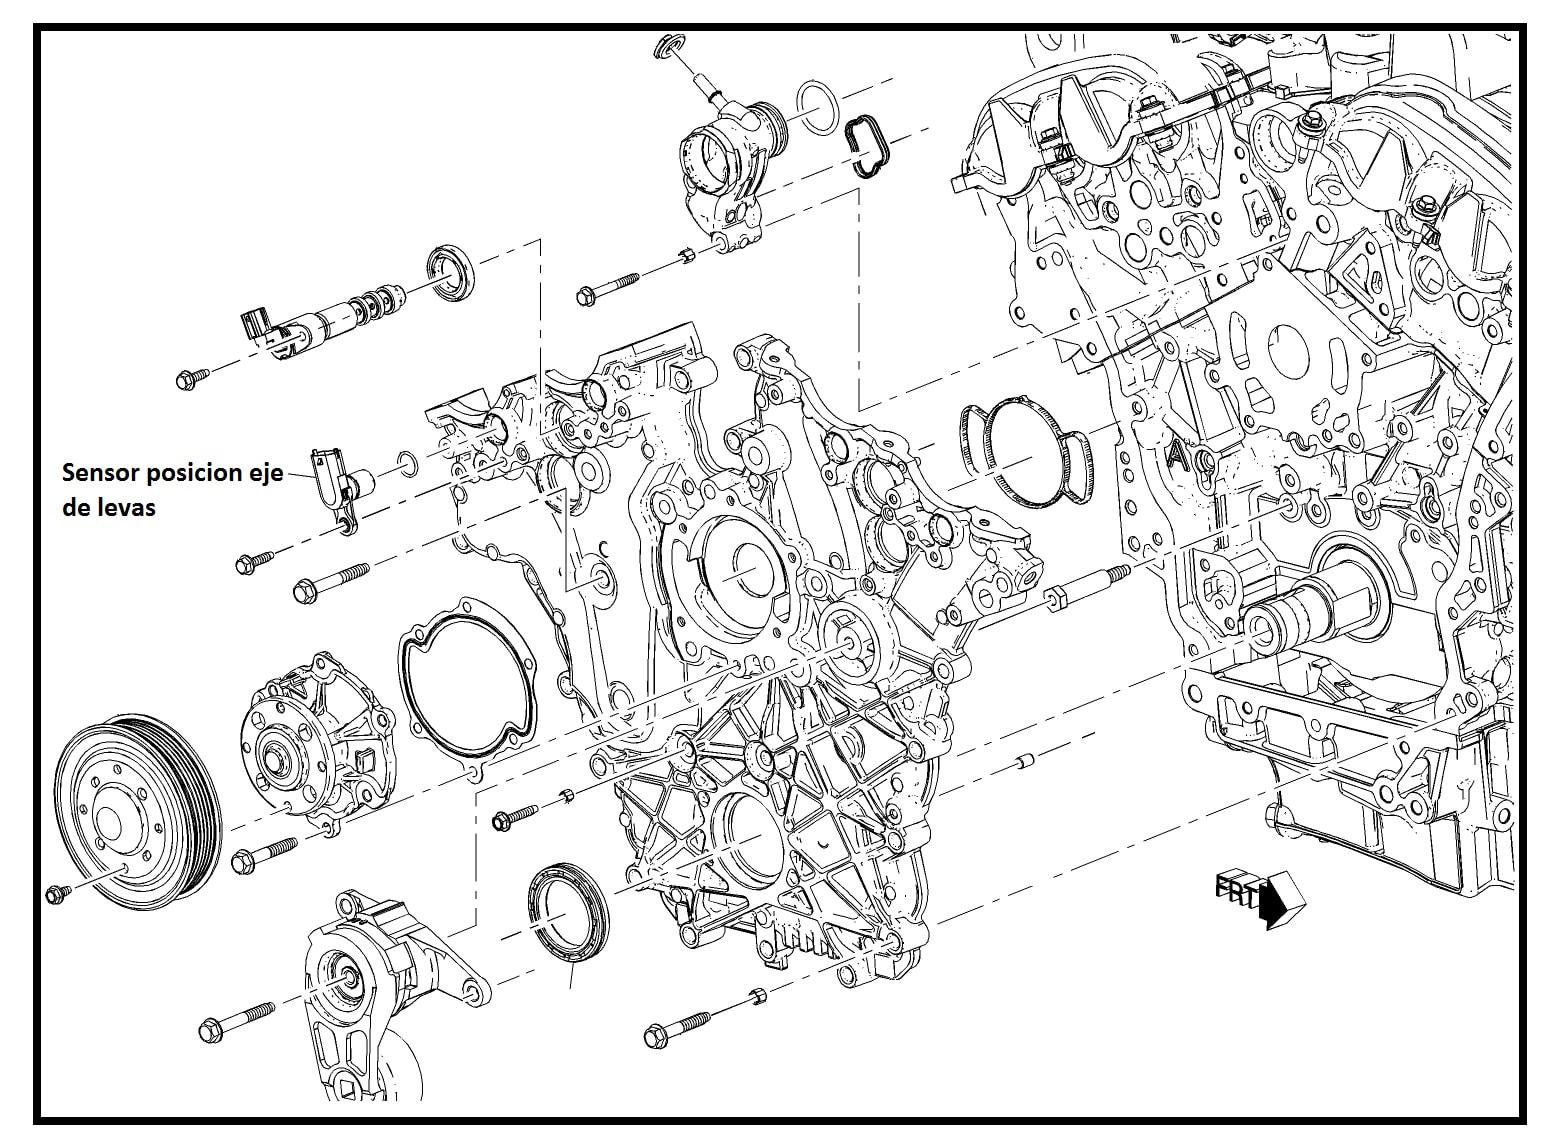 Sensor Posicion Eje De Levas Chevrolet Captiva 3 0 3 6